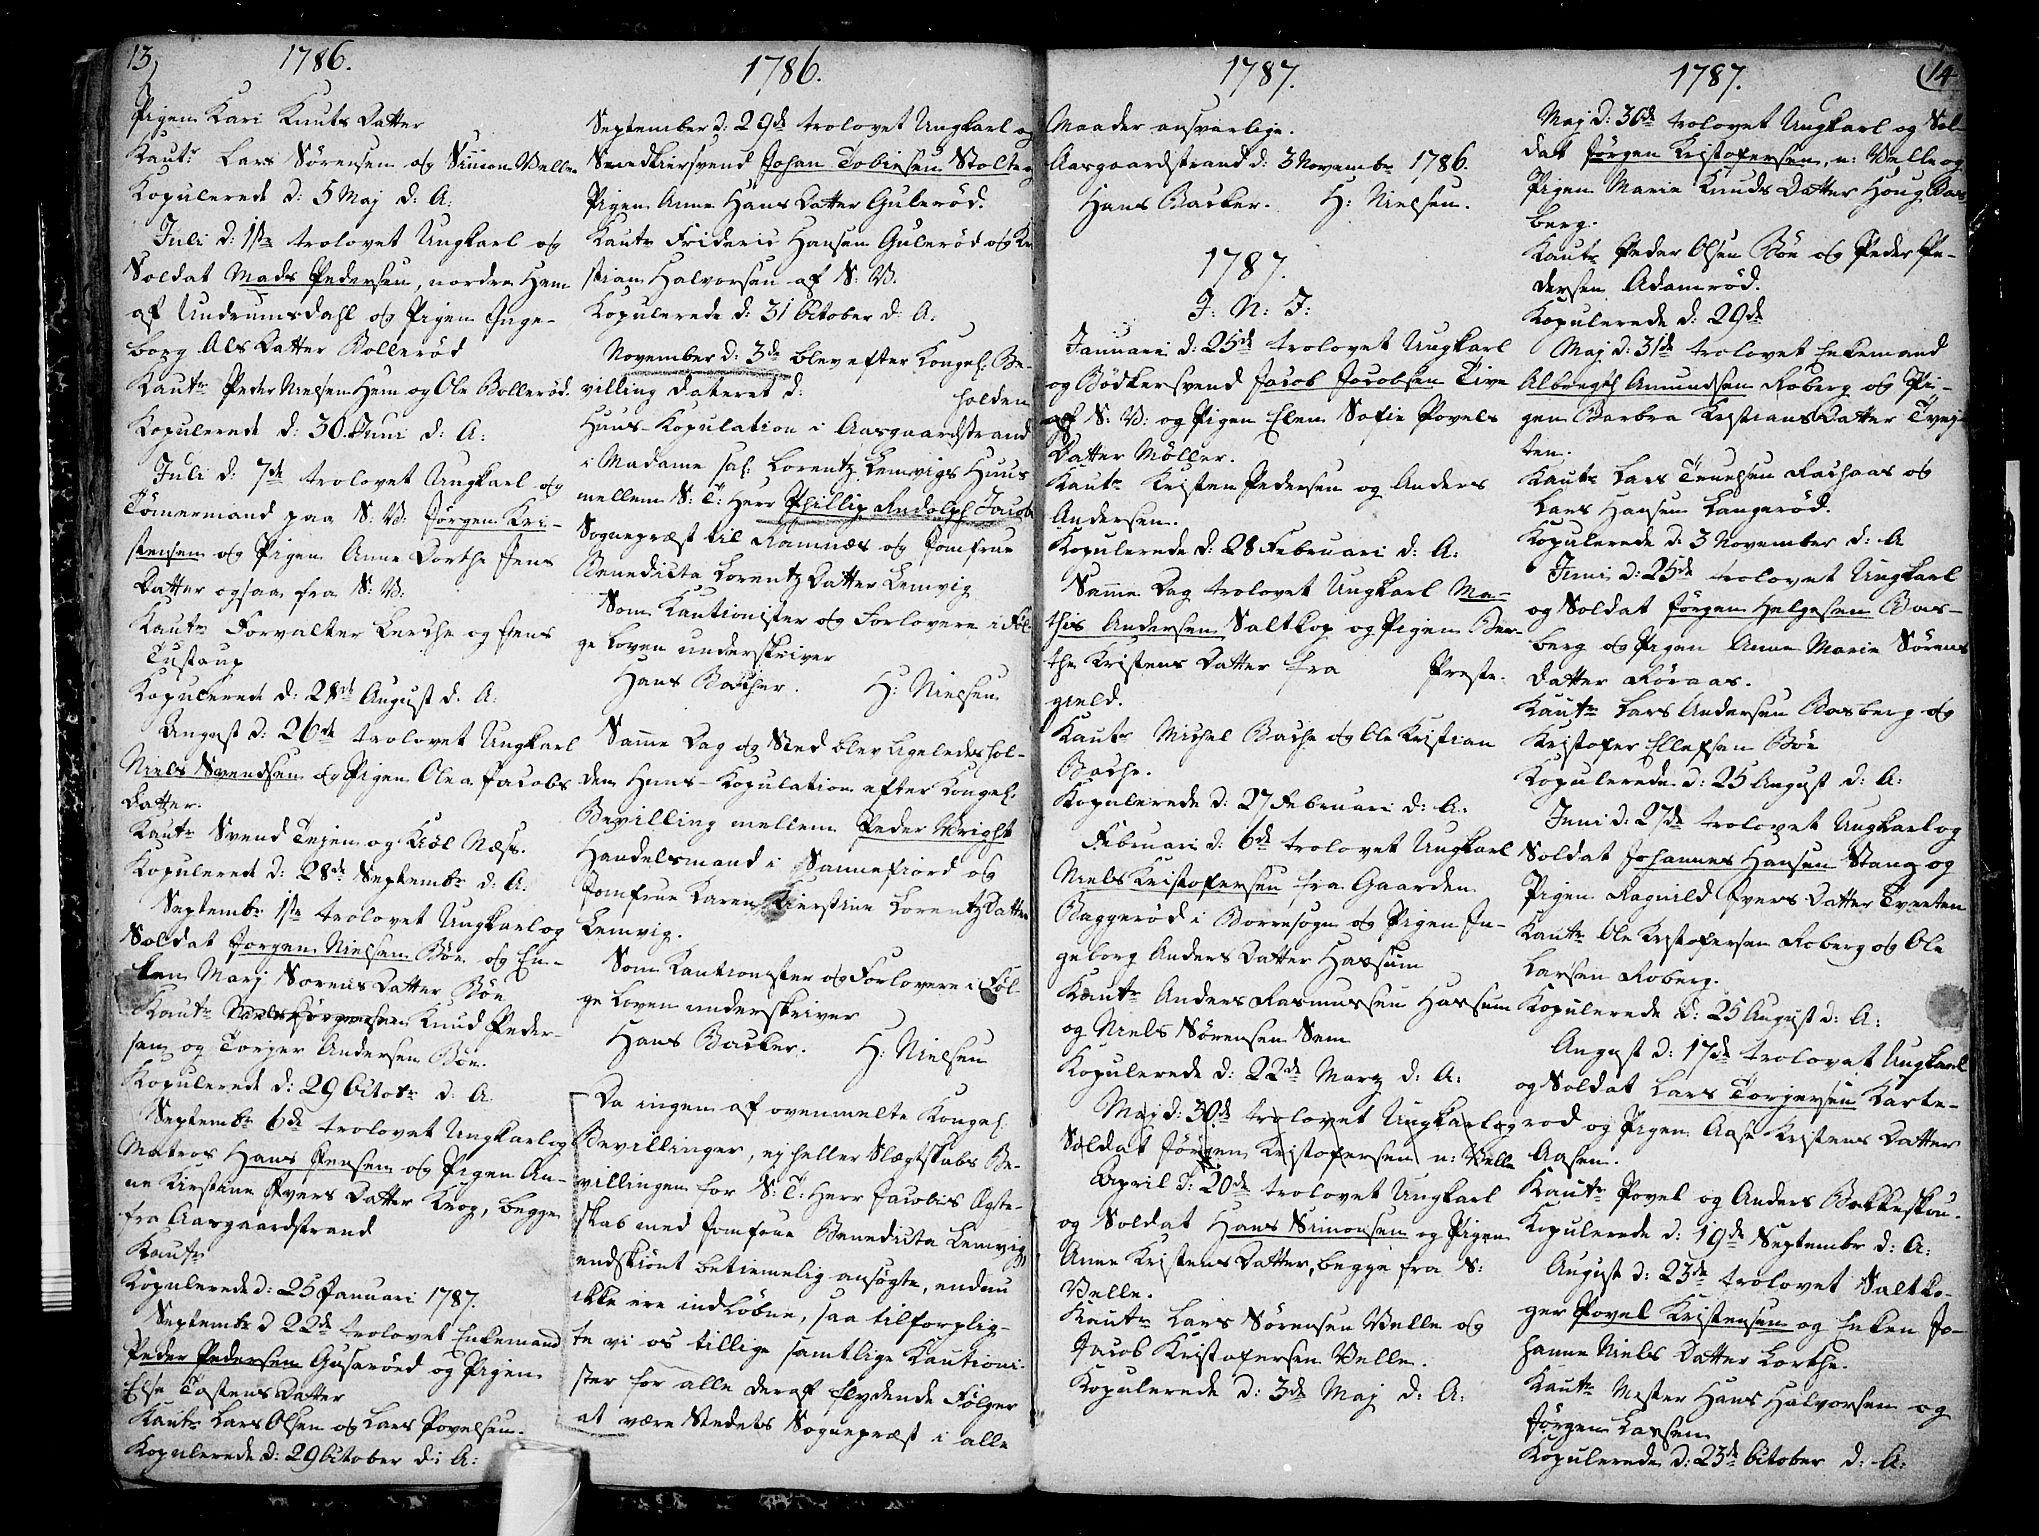 SAKO, Sem kirkebøker, F/Fb/L0002: Ministerialbok nr. II 2, 1764-1792, s. 13-14